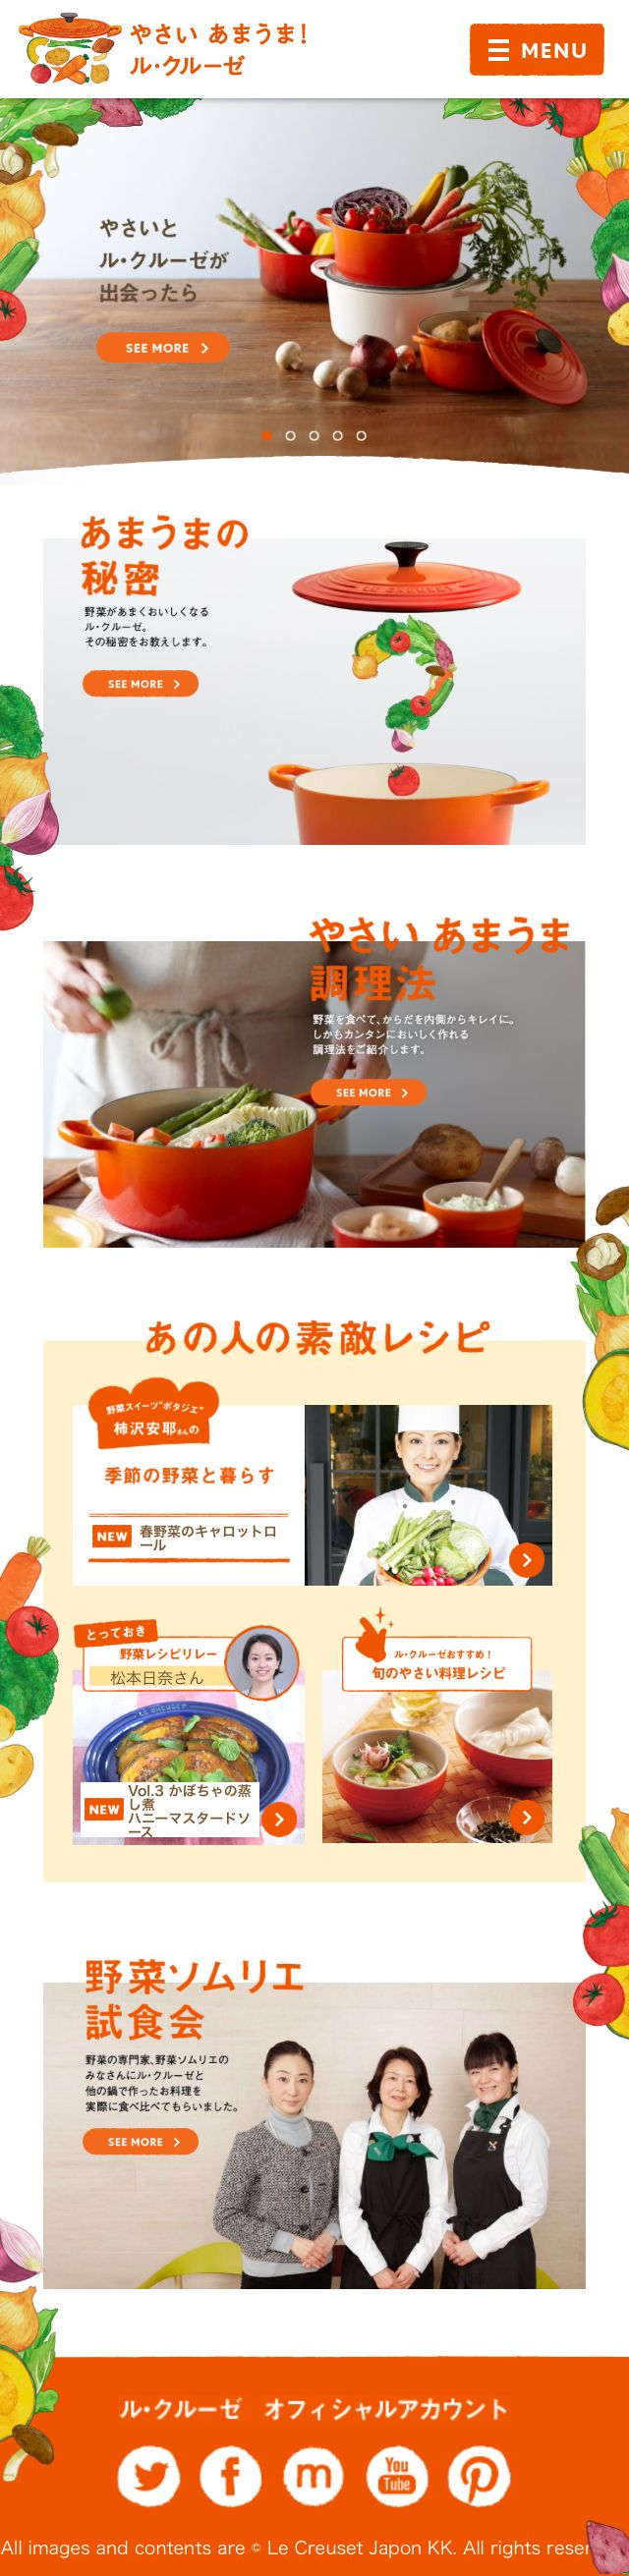 http://www.lecreuset.jp/yasai/